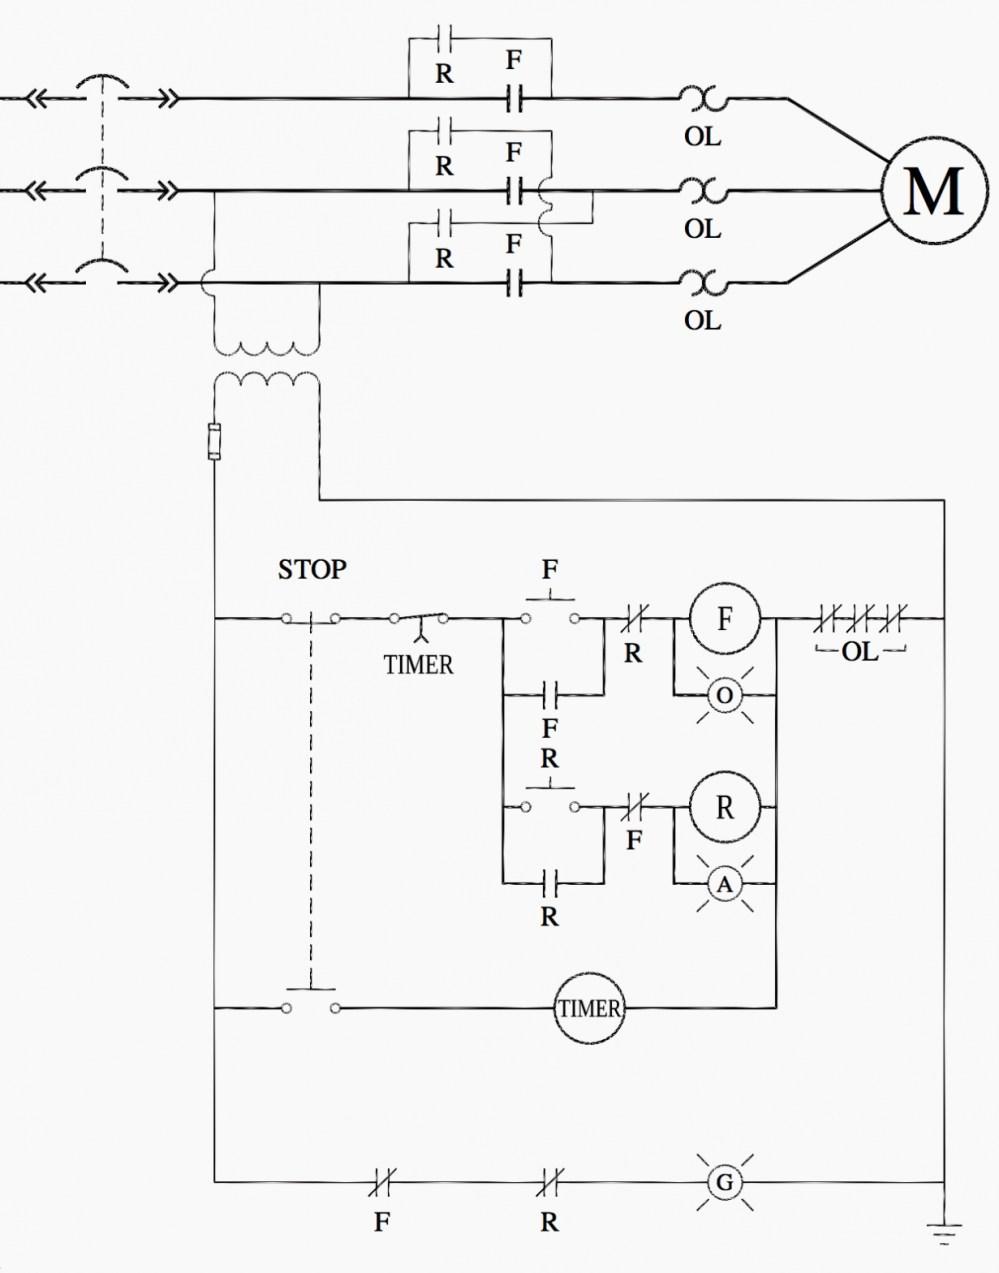 medium resolution of 1231x1568 ladder diagram symbols luxury control diagram symbols sketch electrical sketch